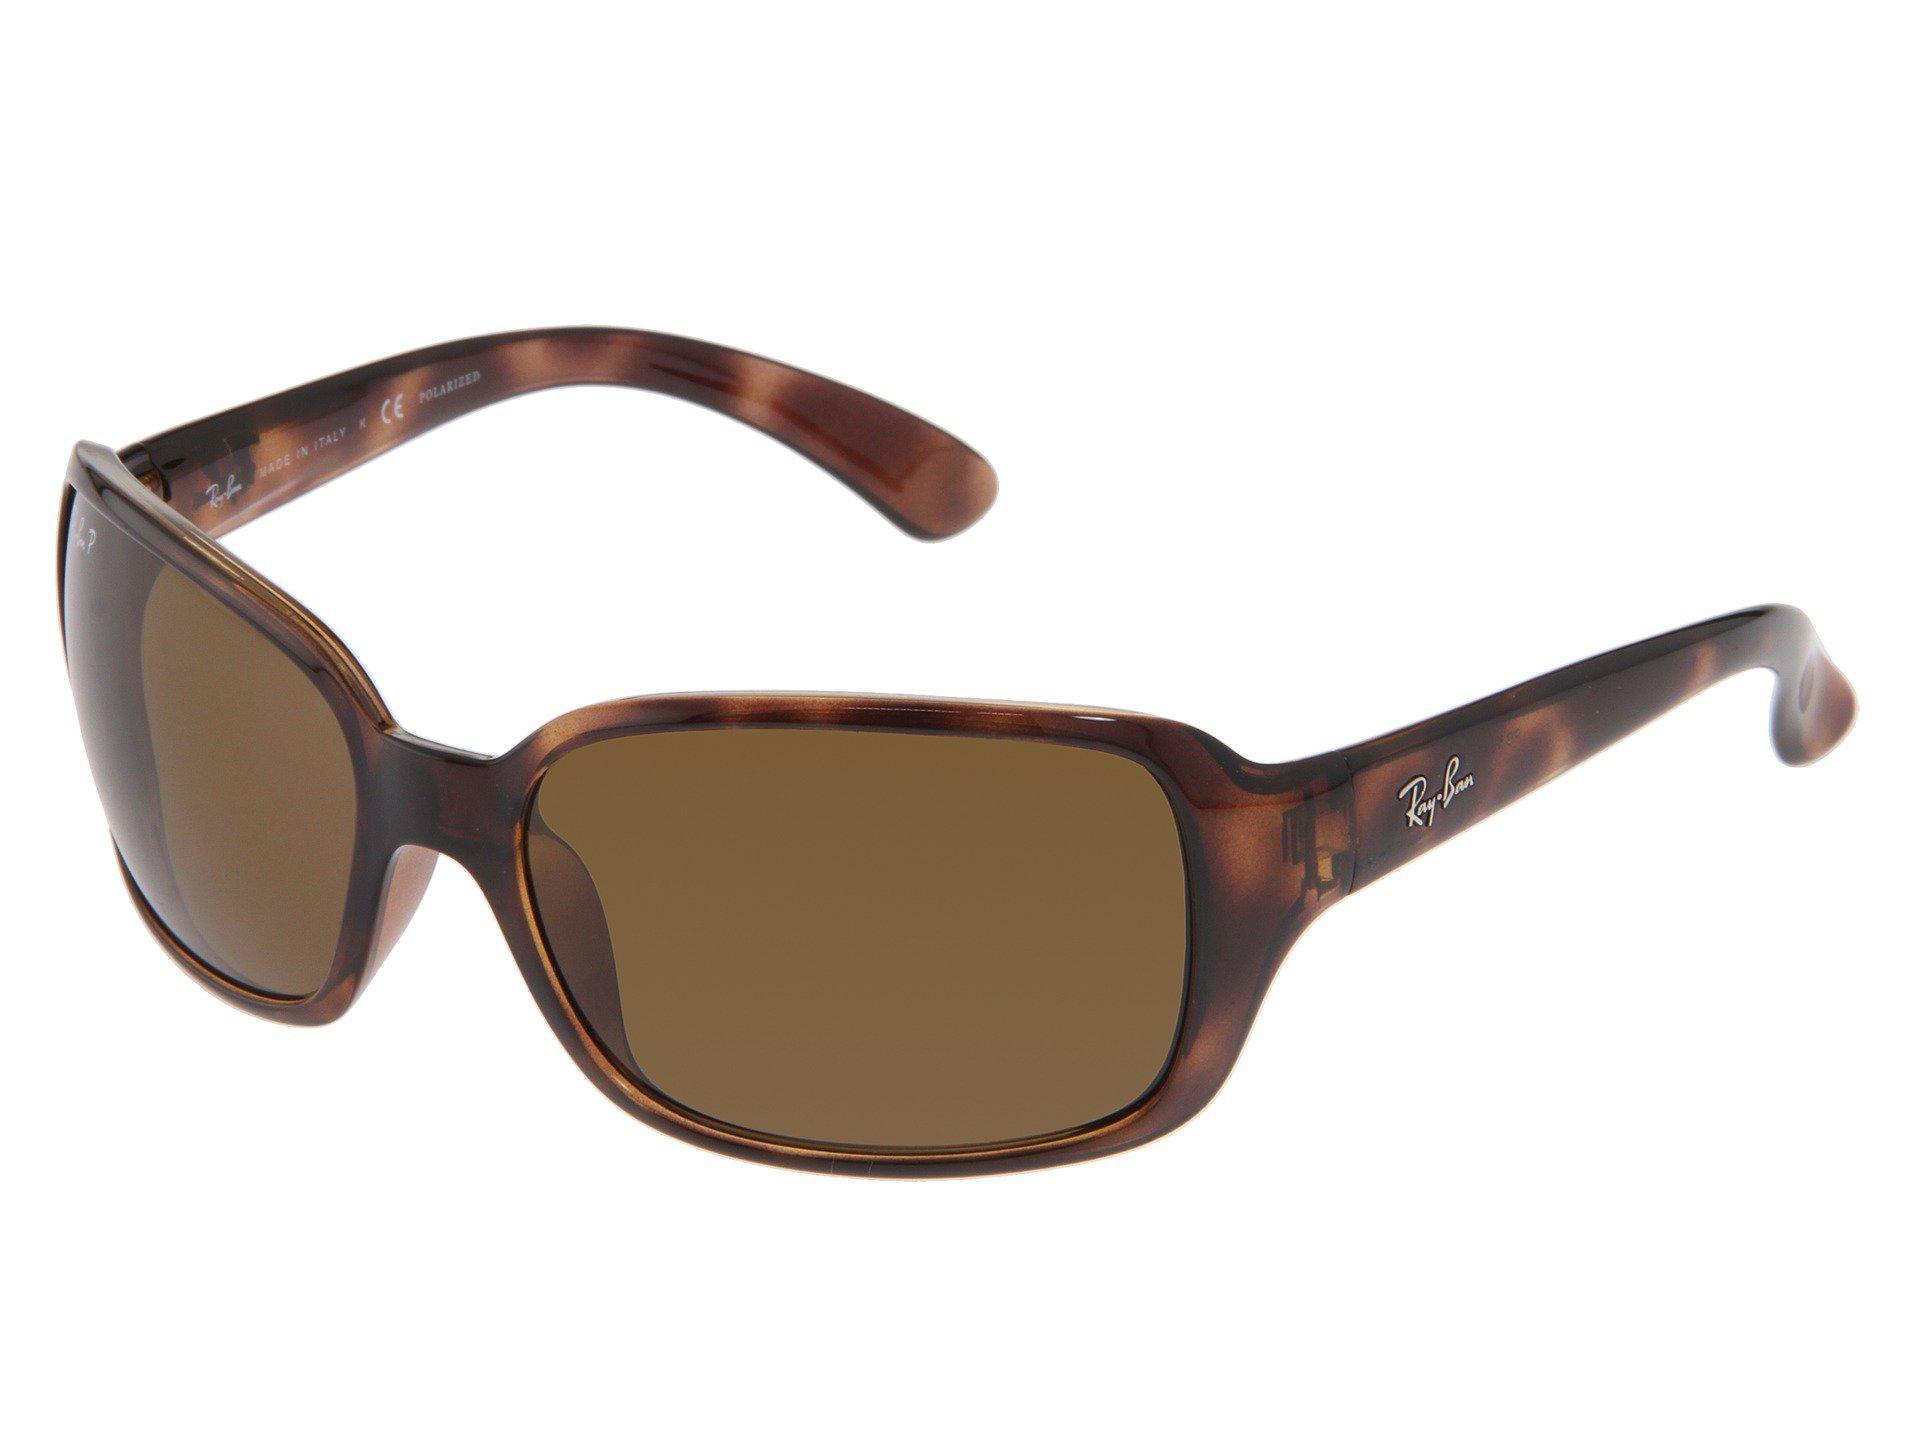 1a6b5c4ba700 Ray-Ban. Women s Rb4068 Polarized (havana natural Brown Polarized Lens)  Sport Sunglasses